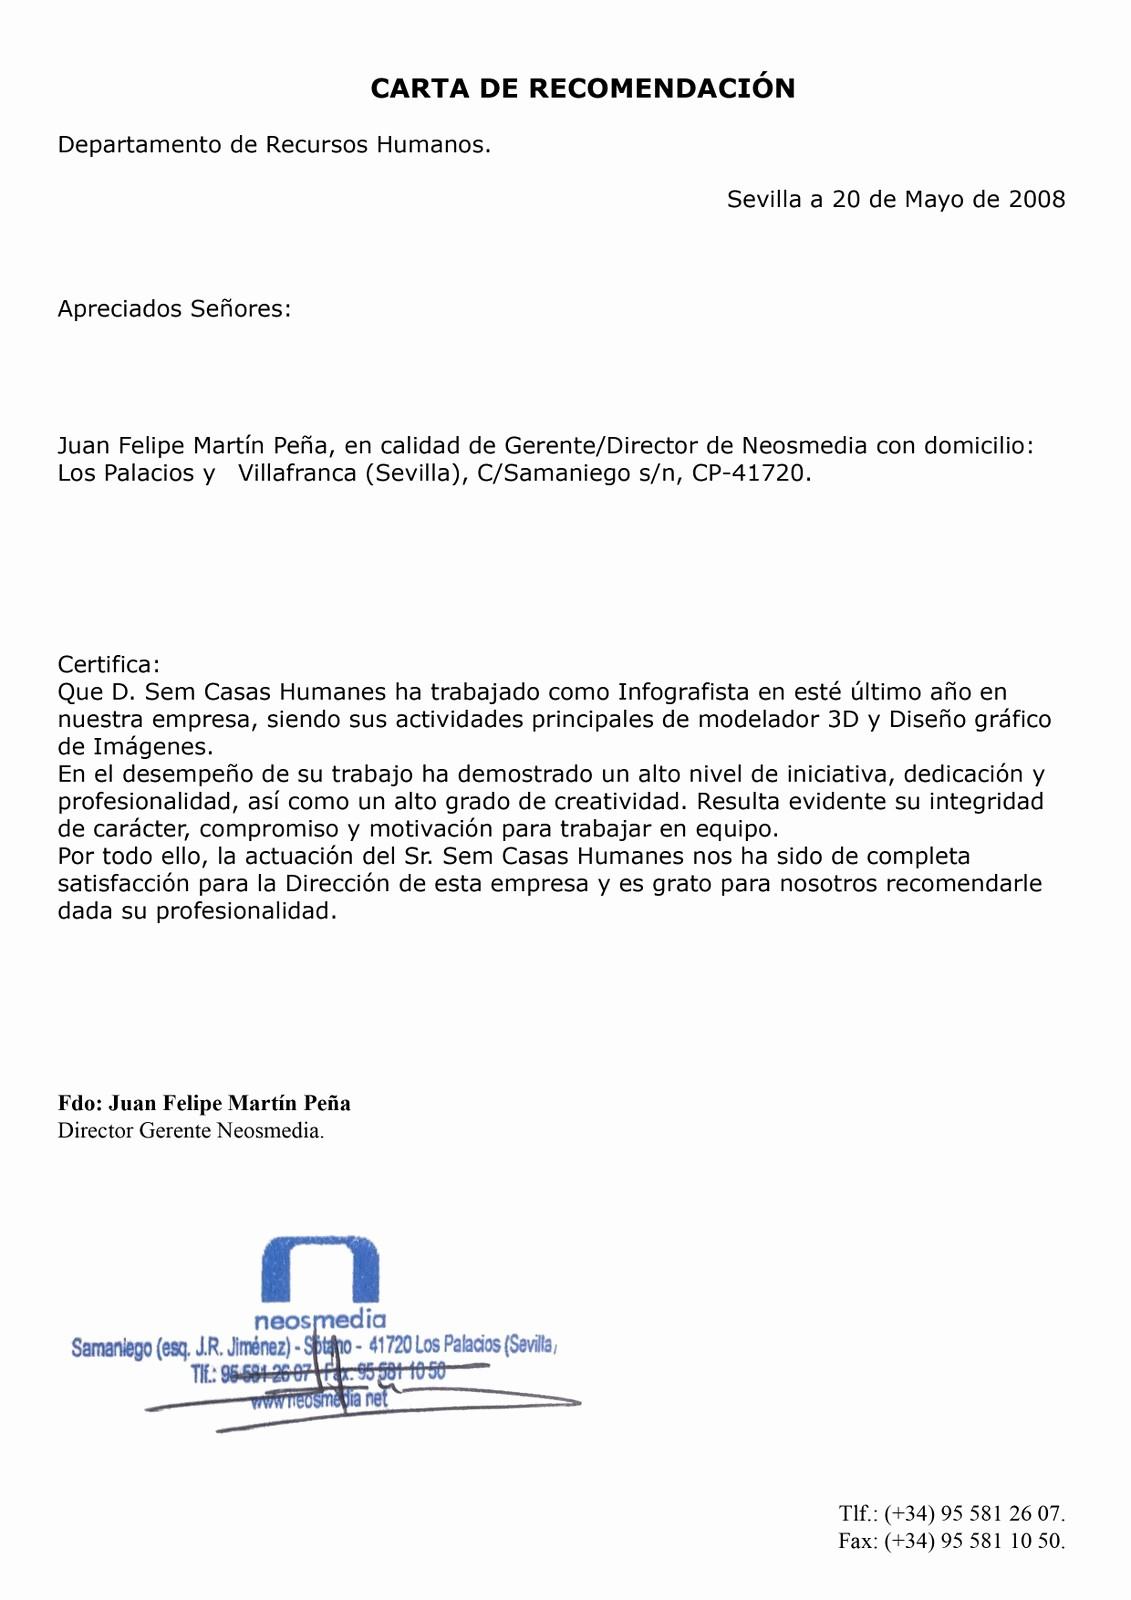 Machote Carta De Recomendacion Personal Awesome Machote Carta De Re Endacion Laboral Imagui